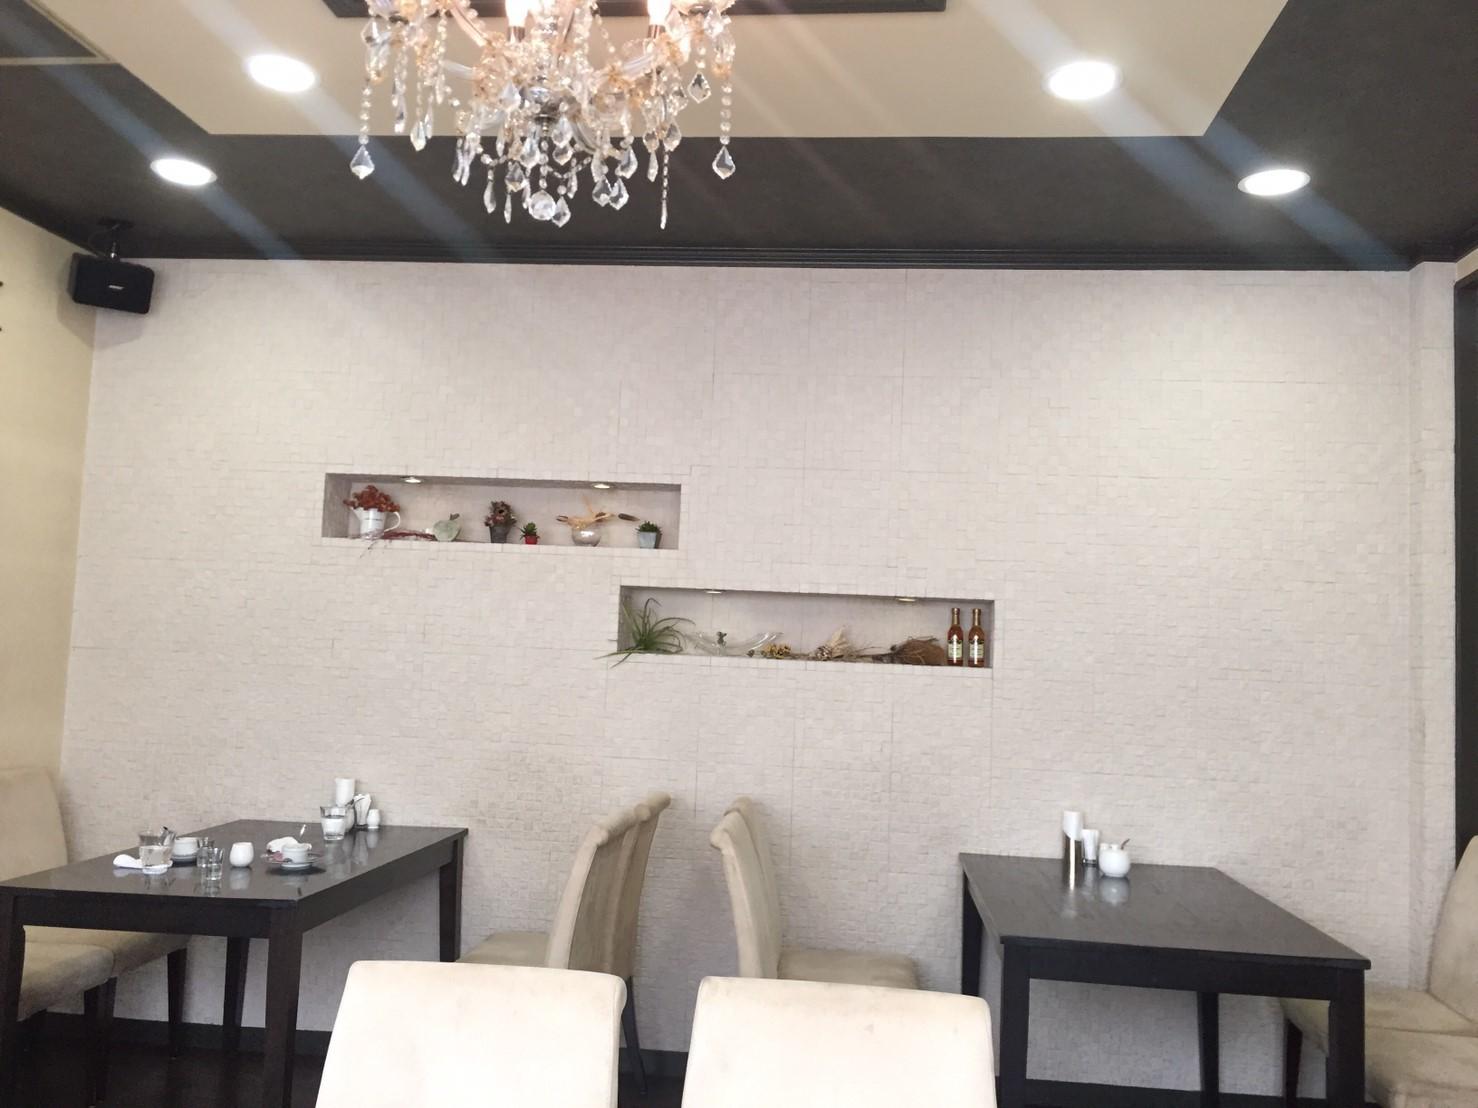 cafe & restaurant Andrews  日替わり  ジャンボ有頭海老フライ_e0115904_00362409.jpg